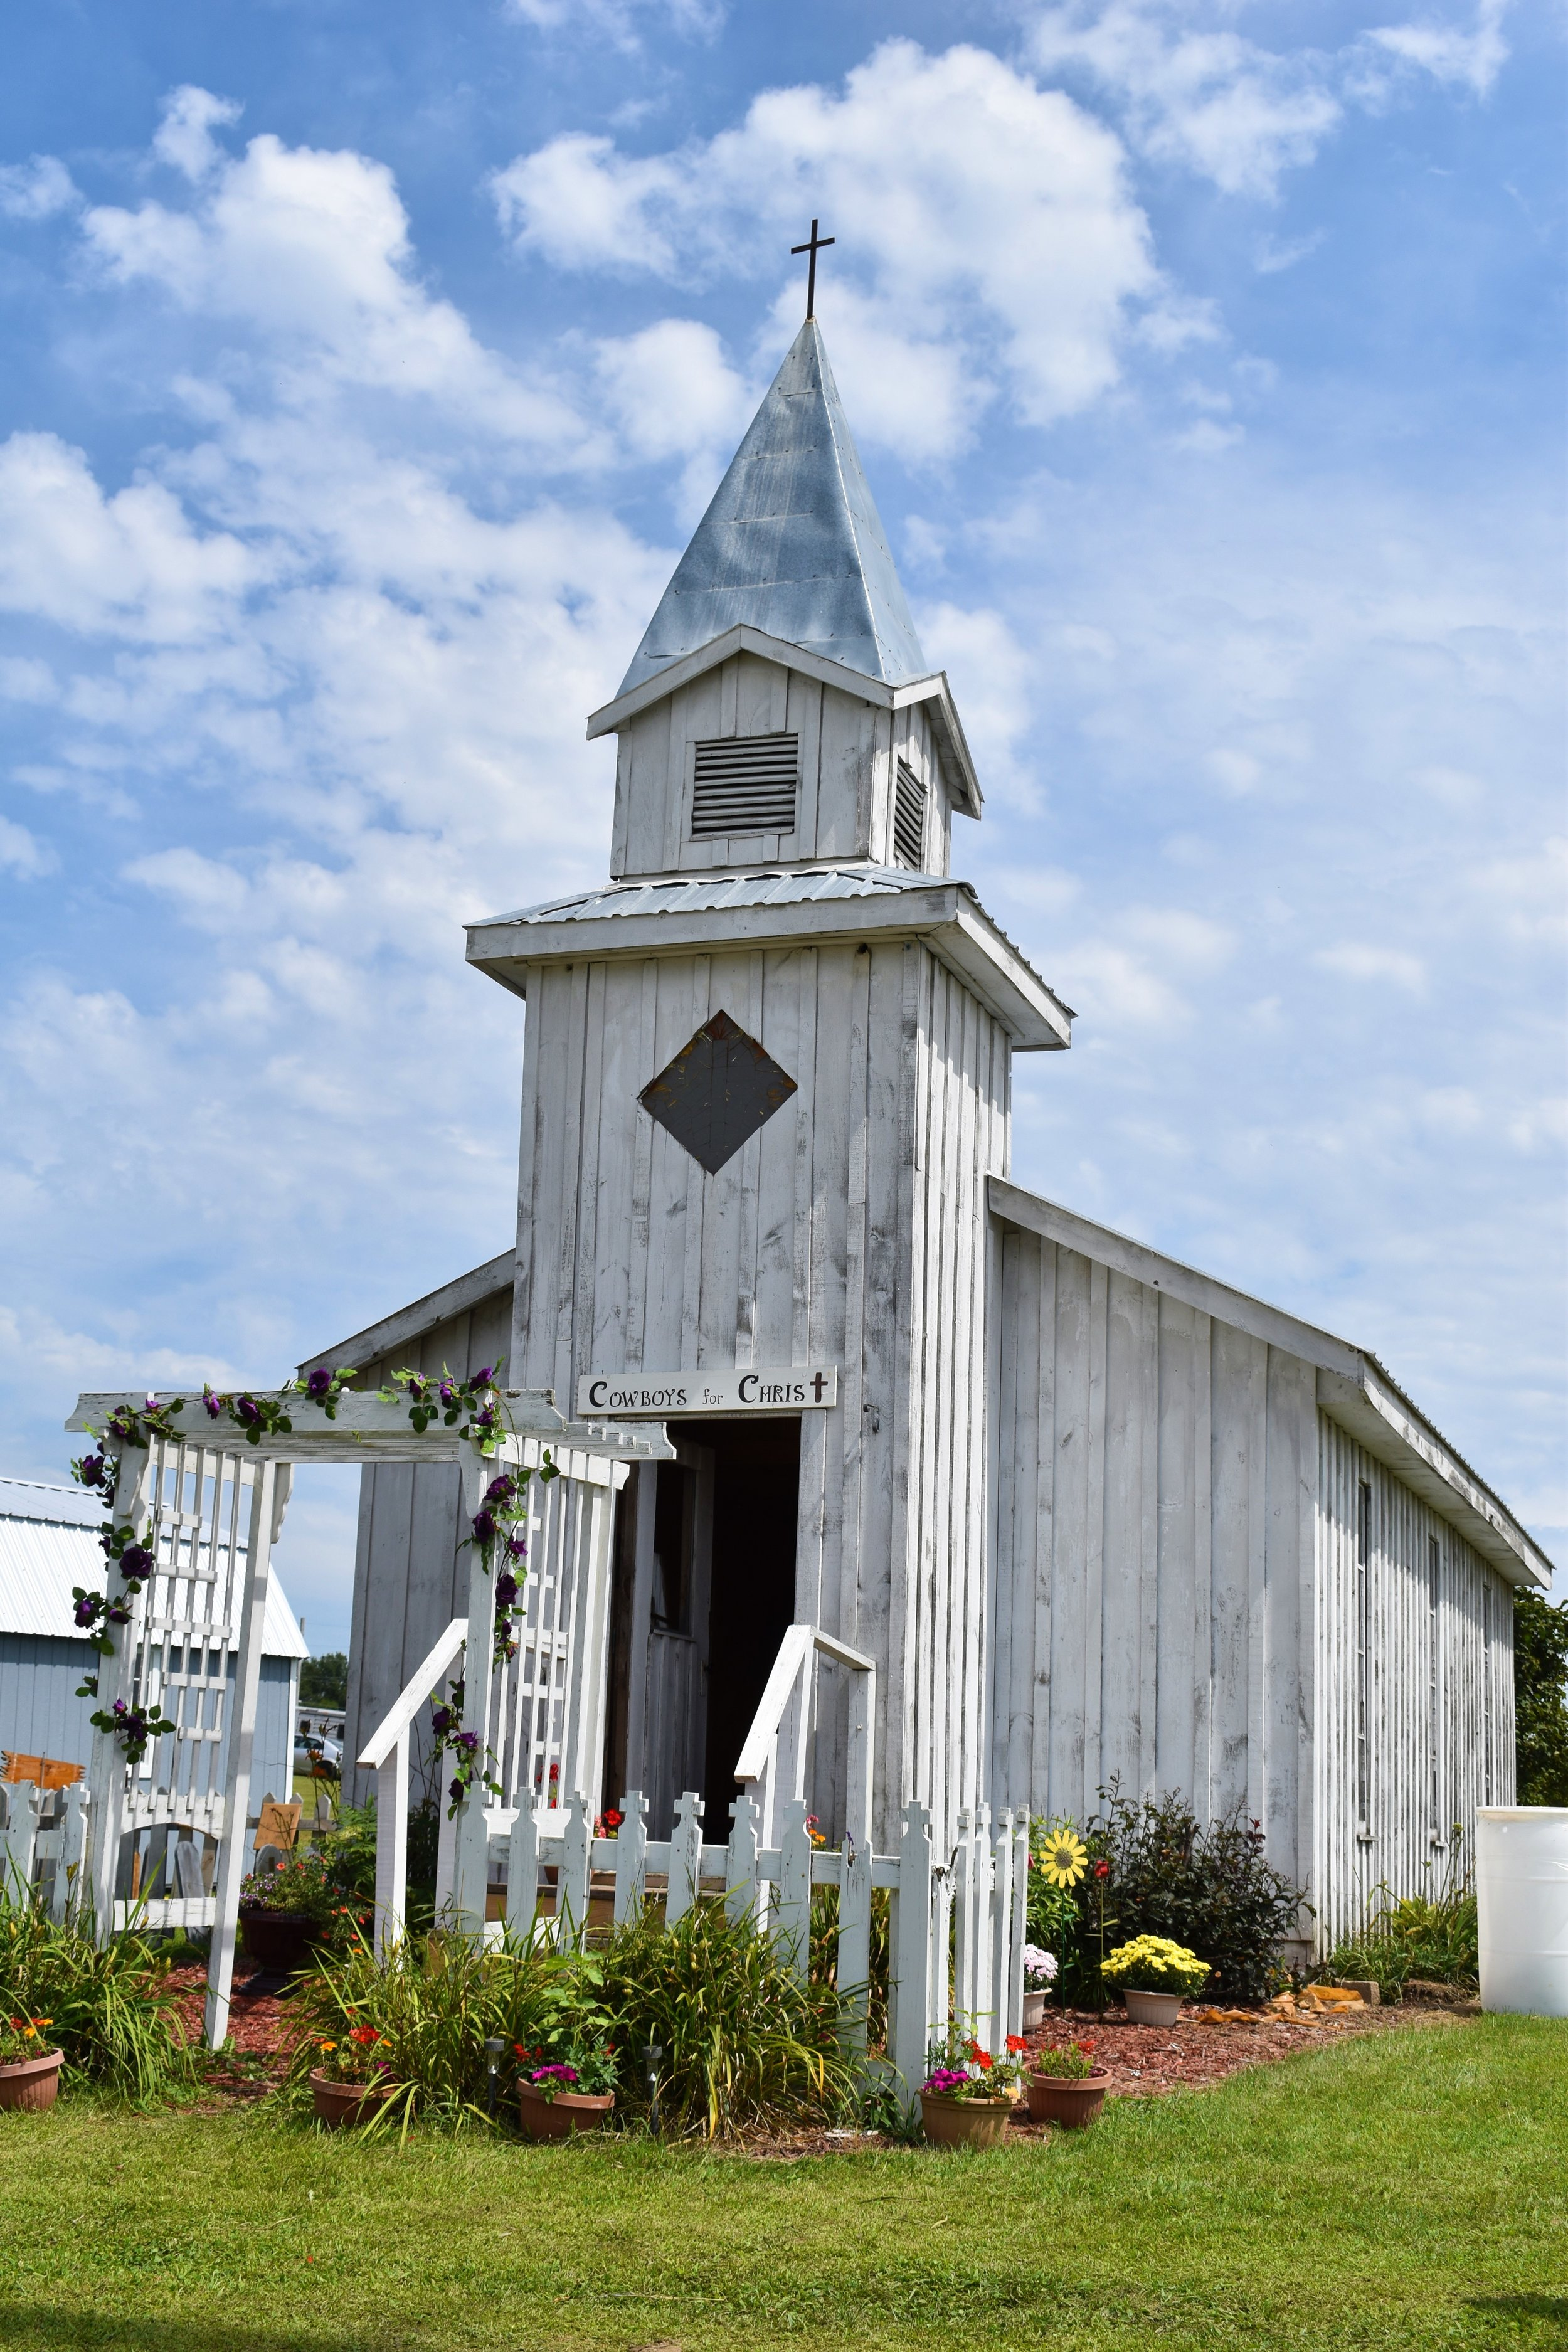 The Cowboys for Christ church